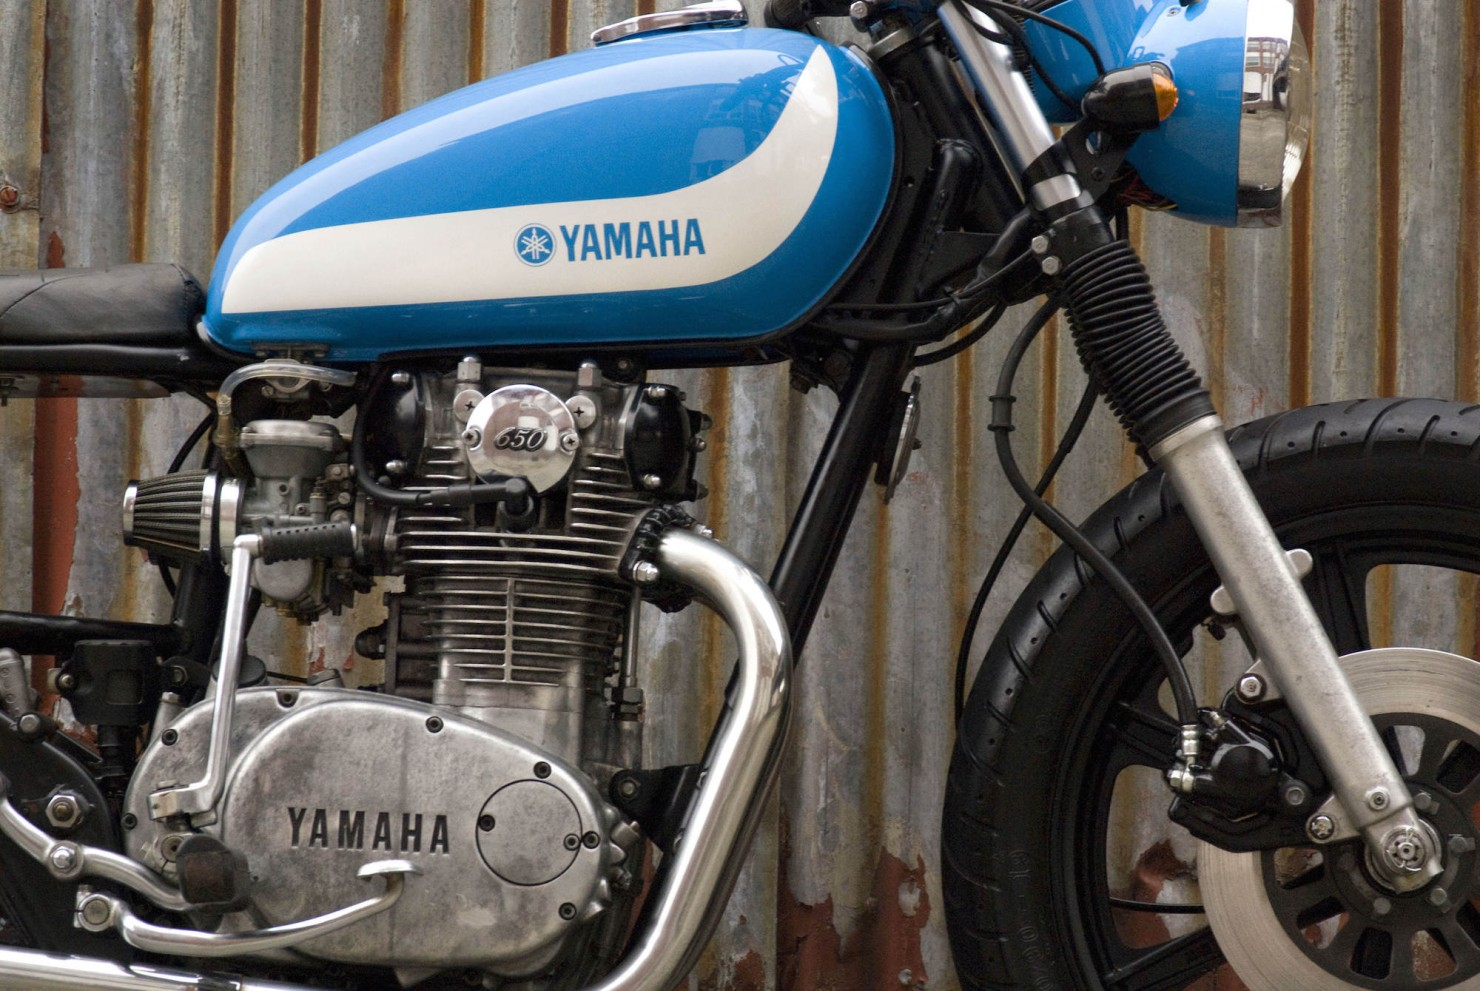 Yamaha XS650 by vintagesteele_7